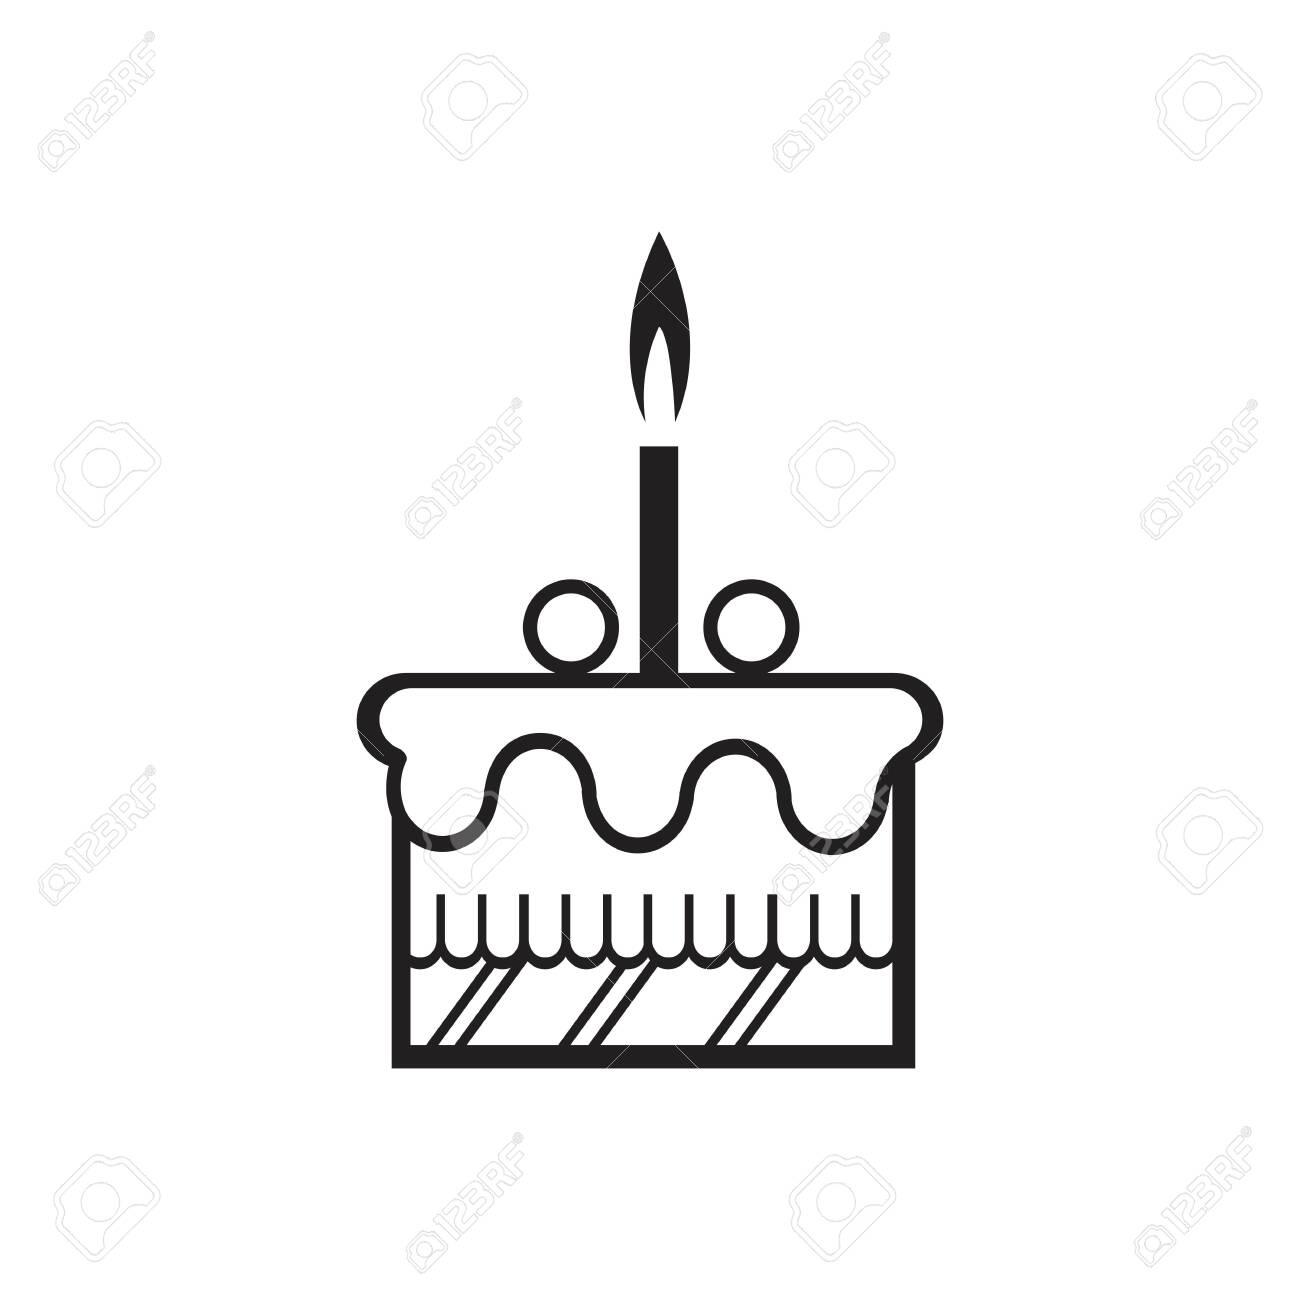 Marvelous Birthday Cake Icon Vector Design Template Royalty Free Cliparts Funny Birthday Cards Online Kookostrdamsfinfo